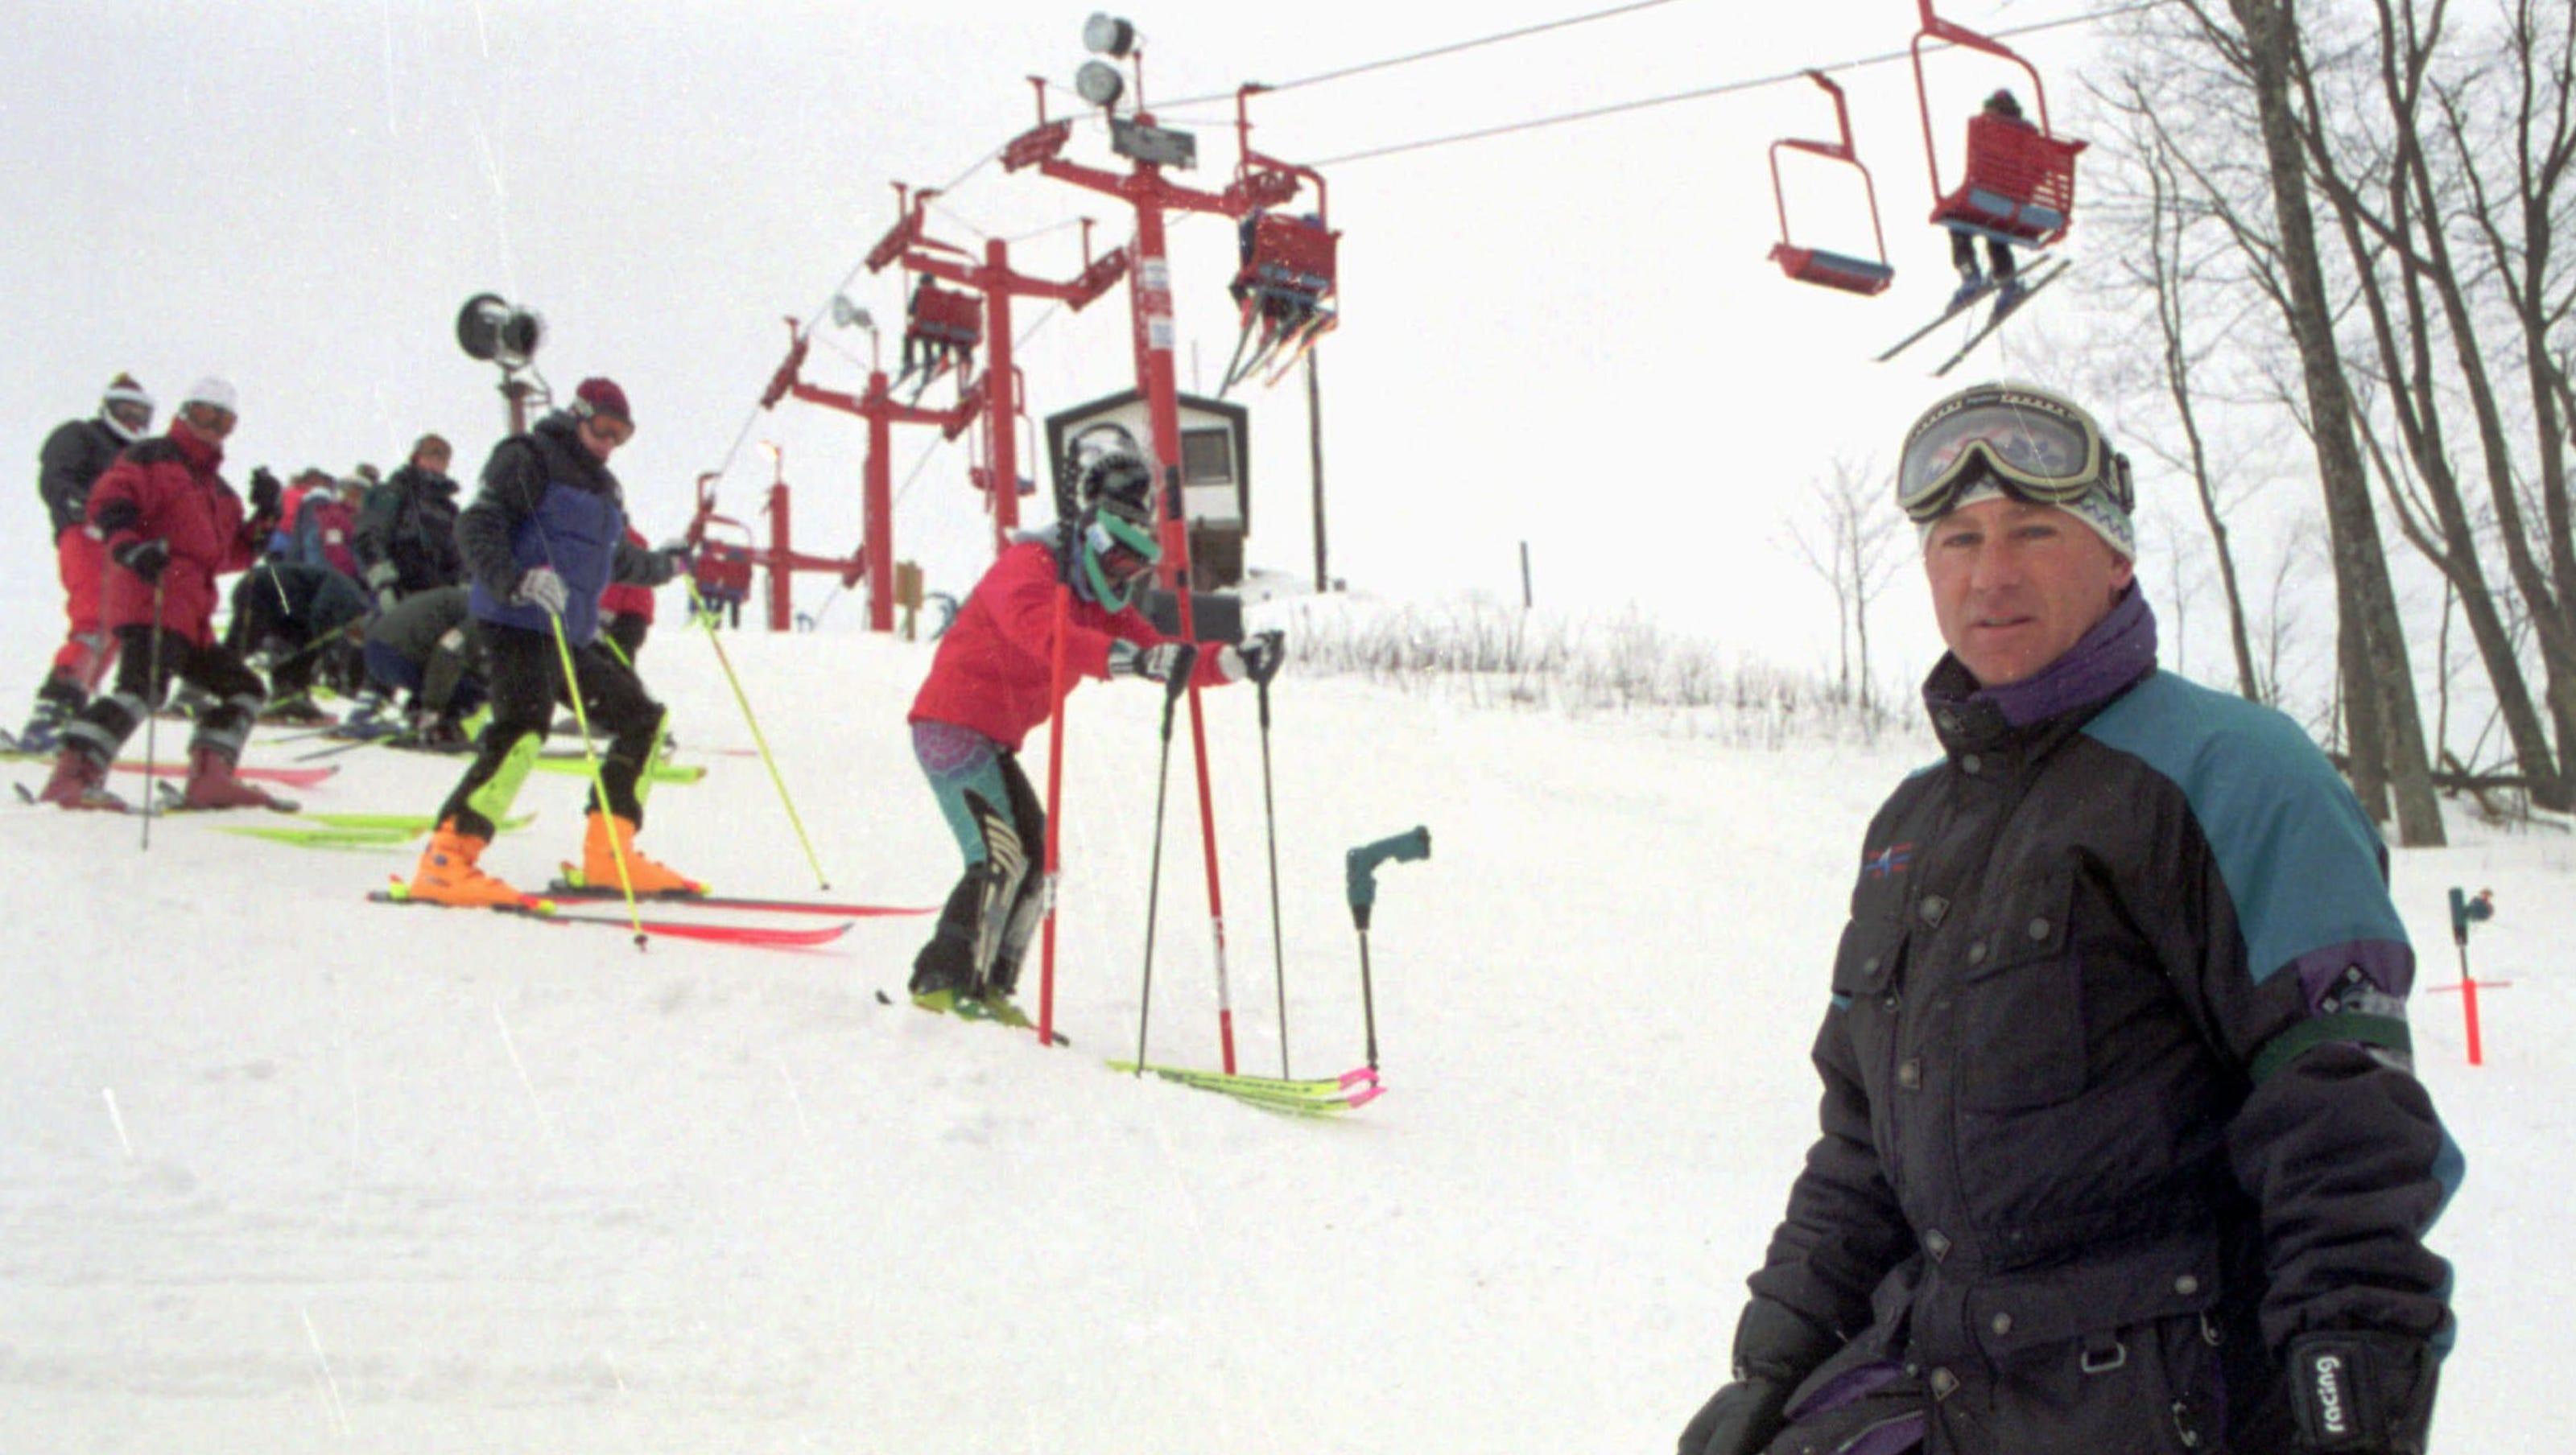 top 10 ski resorts, areas in michigan this winter